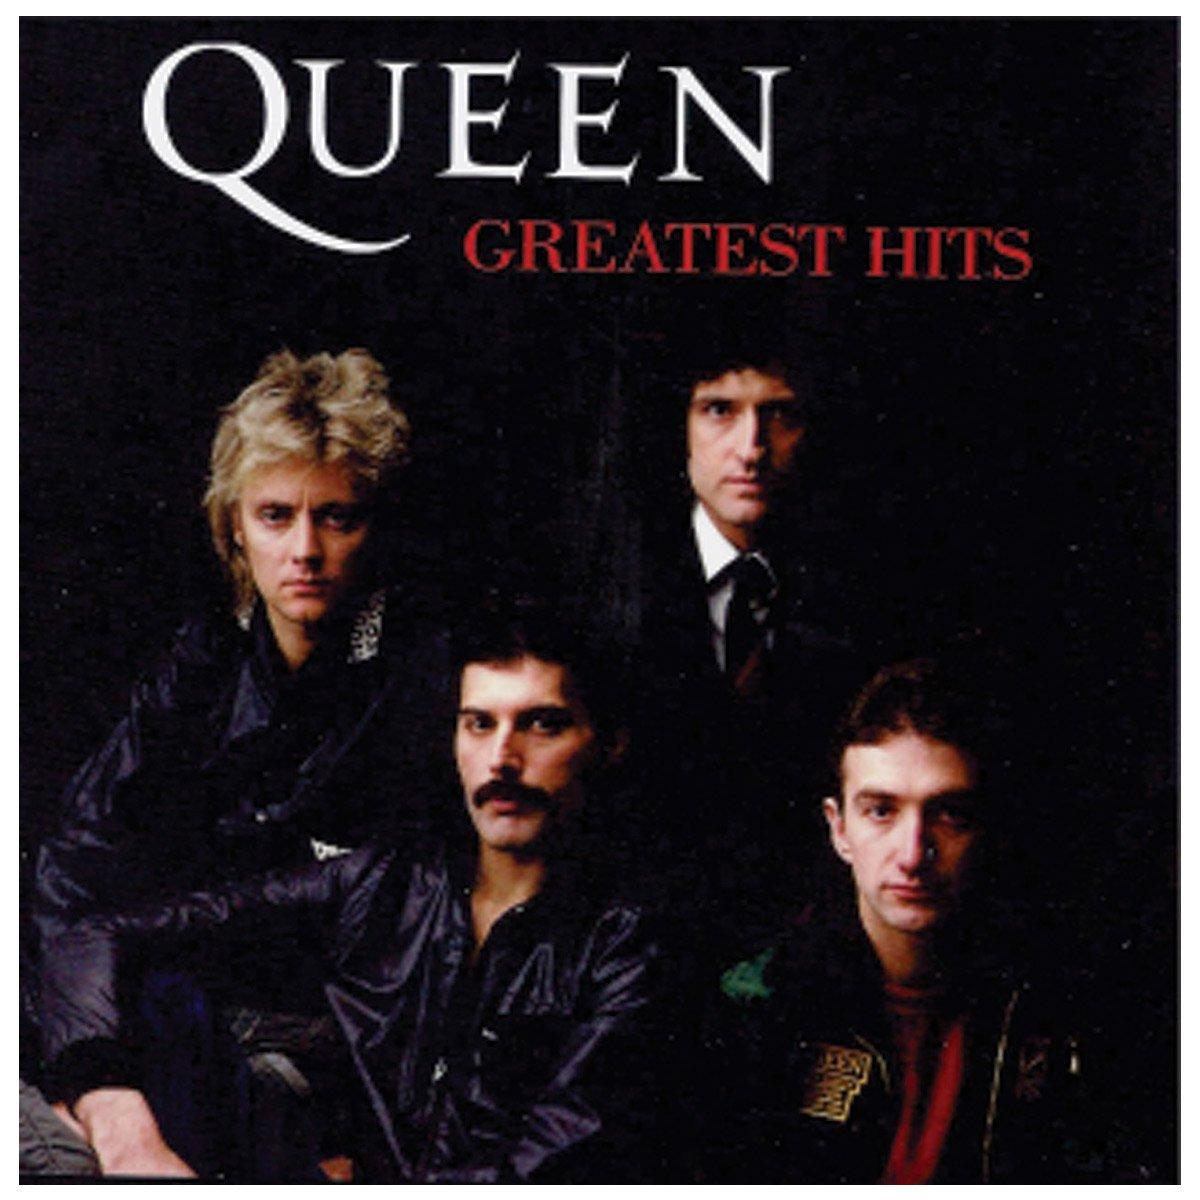 queen greatest hits 1 searscommx me entiende